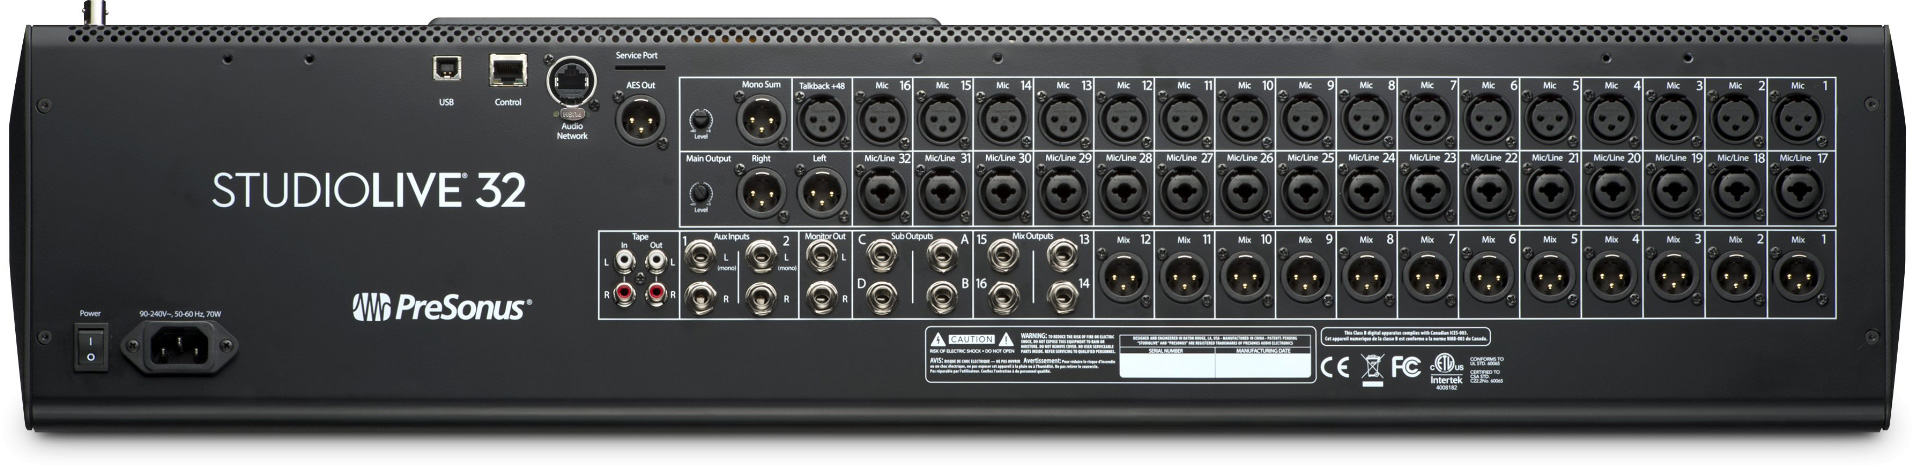 presonus studiolive 32 series iii 32 channel digital mixer with moving faders. Black Bedroom Furniture Sets. Home Design Ideas